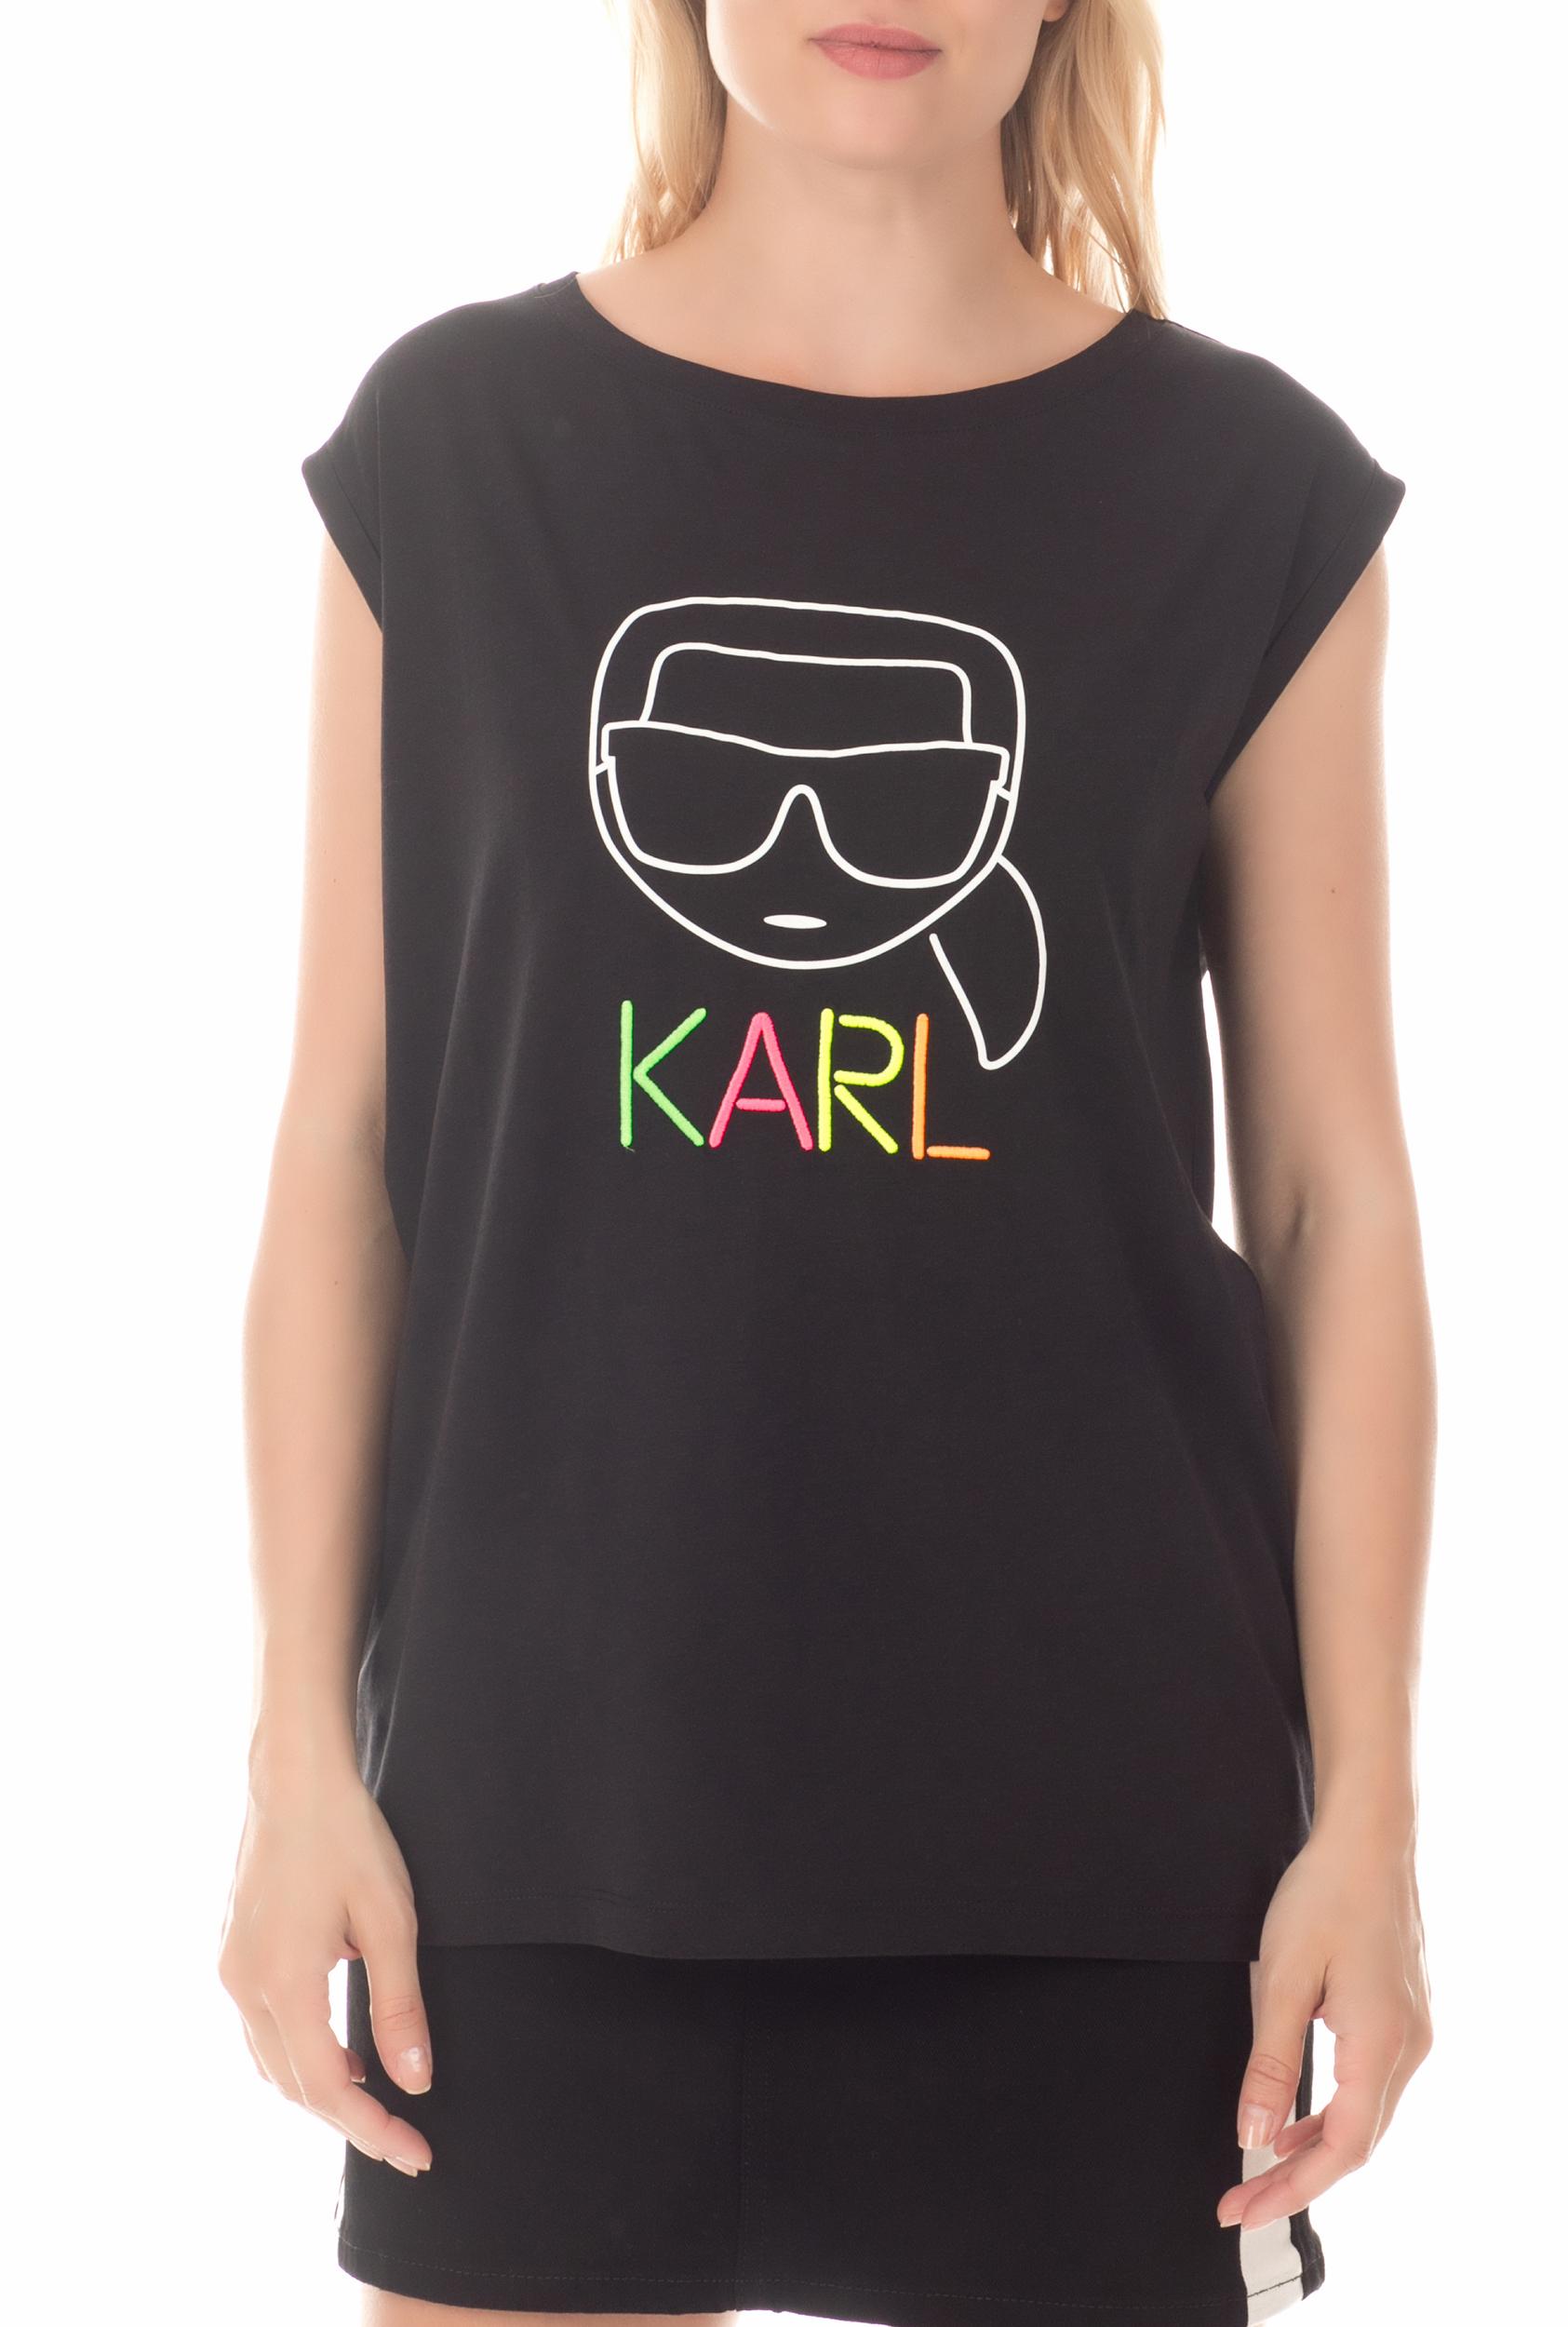 KARL LAGERFELD - Γυναικεία αμάνικη μπλούζα Neon Lights KARL LAGERFELD μαύρη